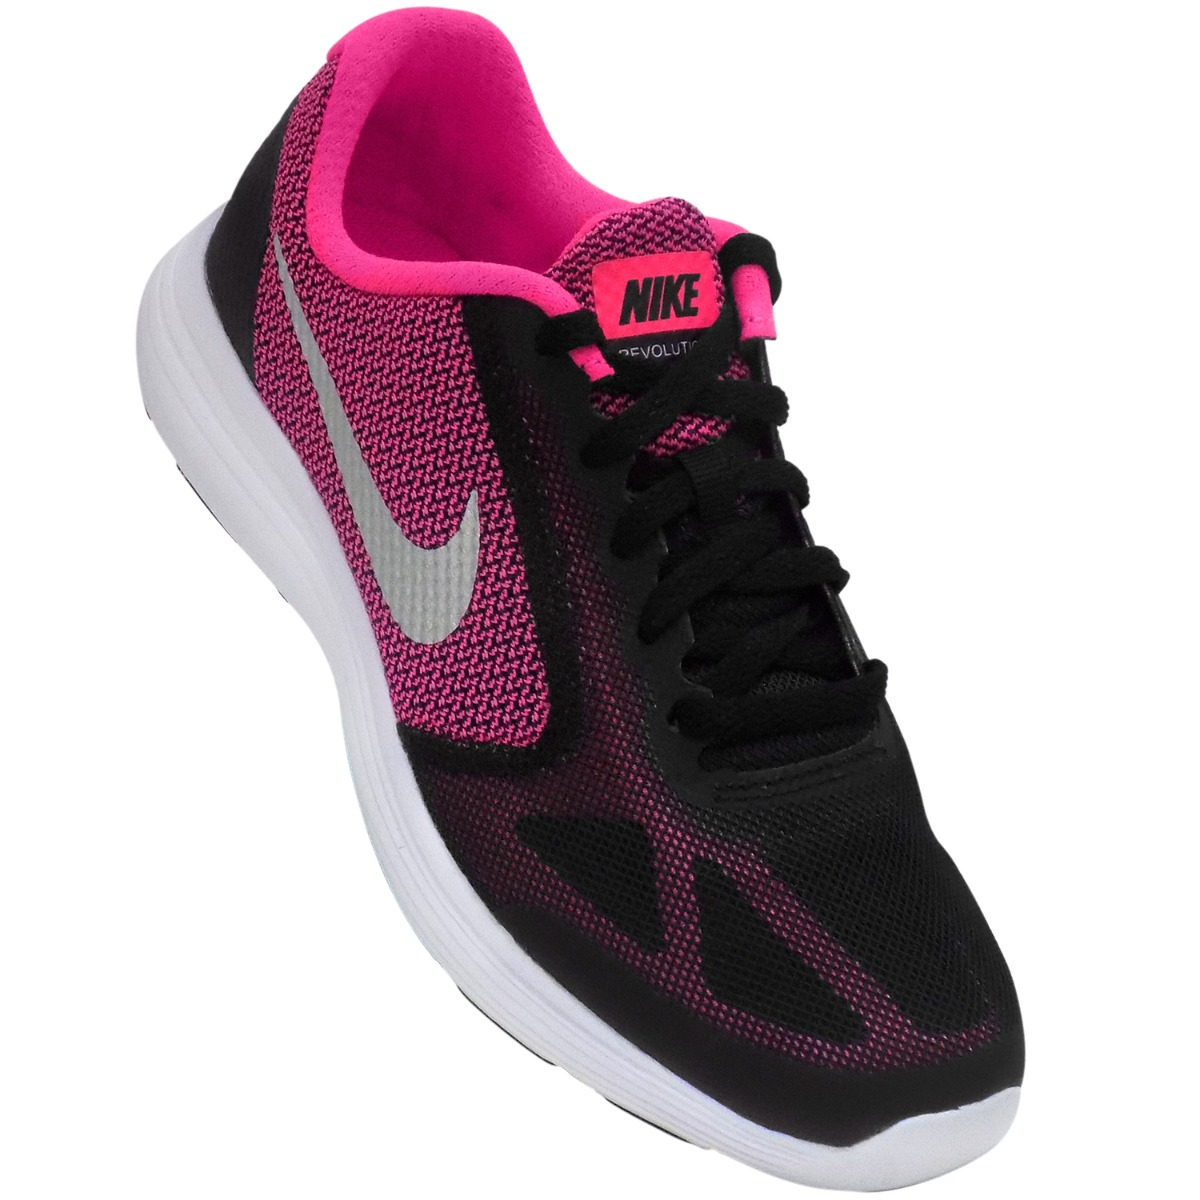 00 Tenis Niña En Revolution Para Libre 799 gs Mercado Nike YwfvqYU